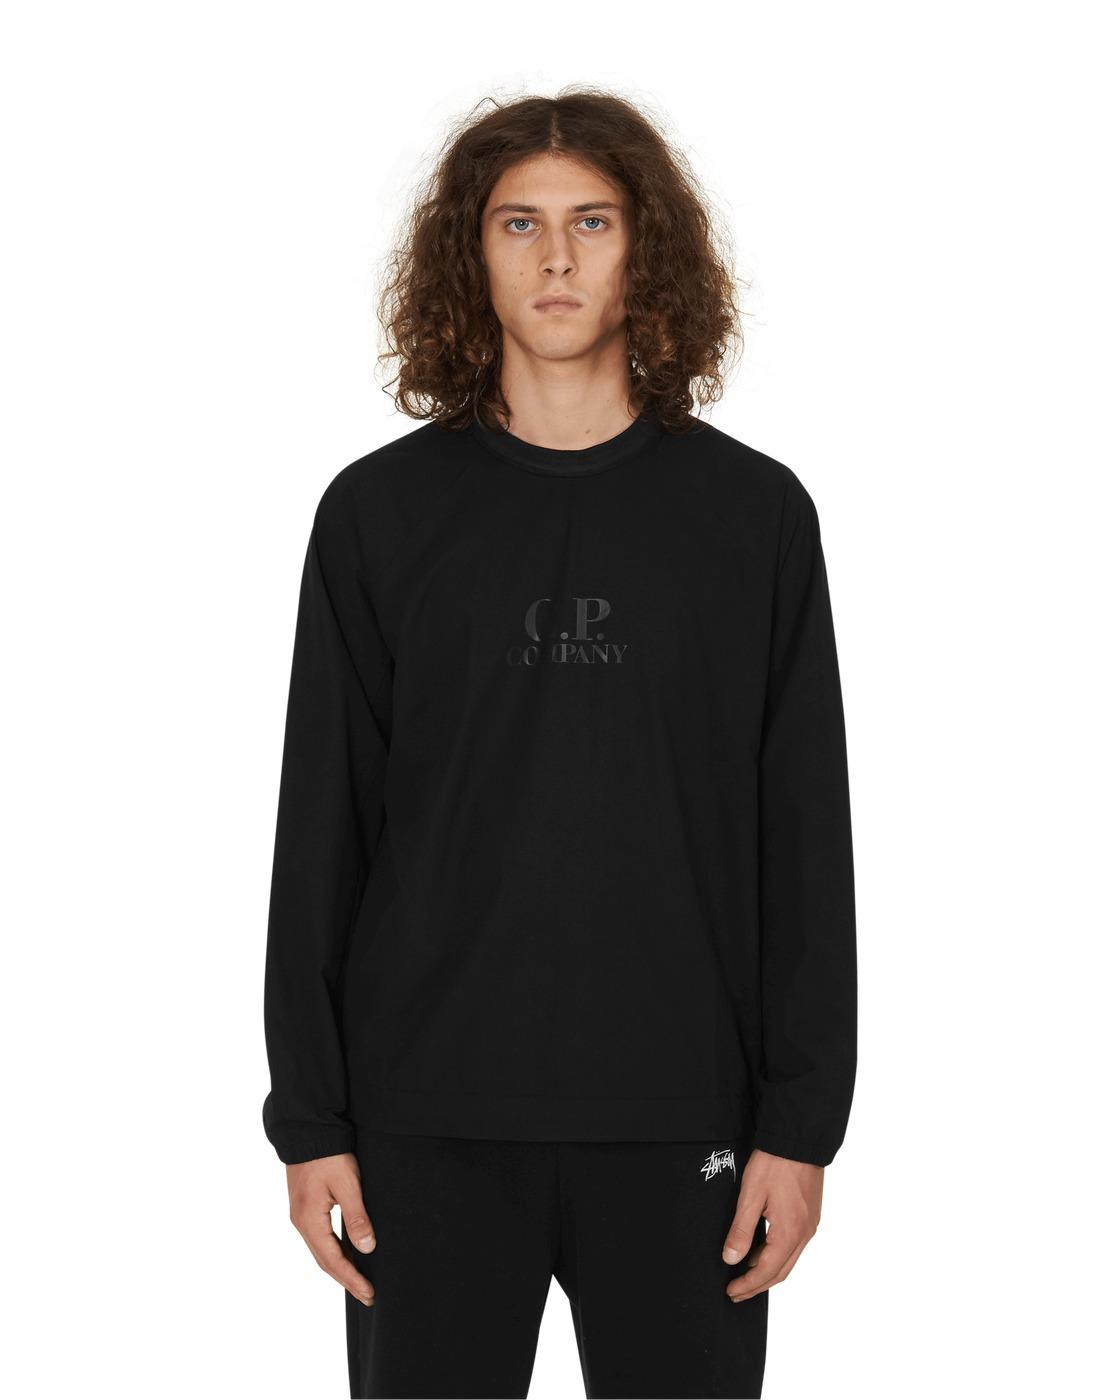 C.P. Company Crewneck Sweatshirt Black